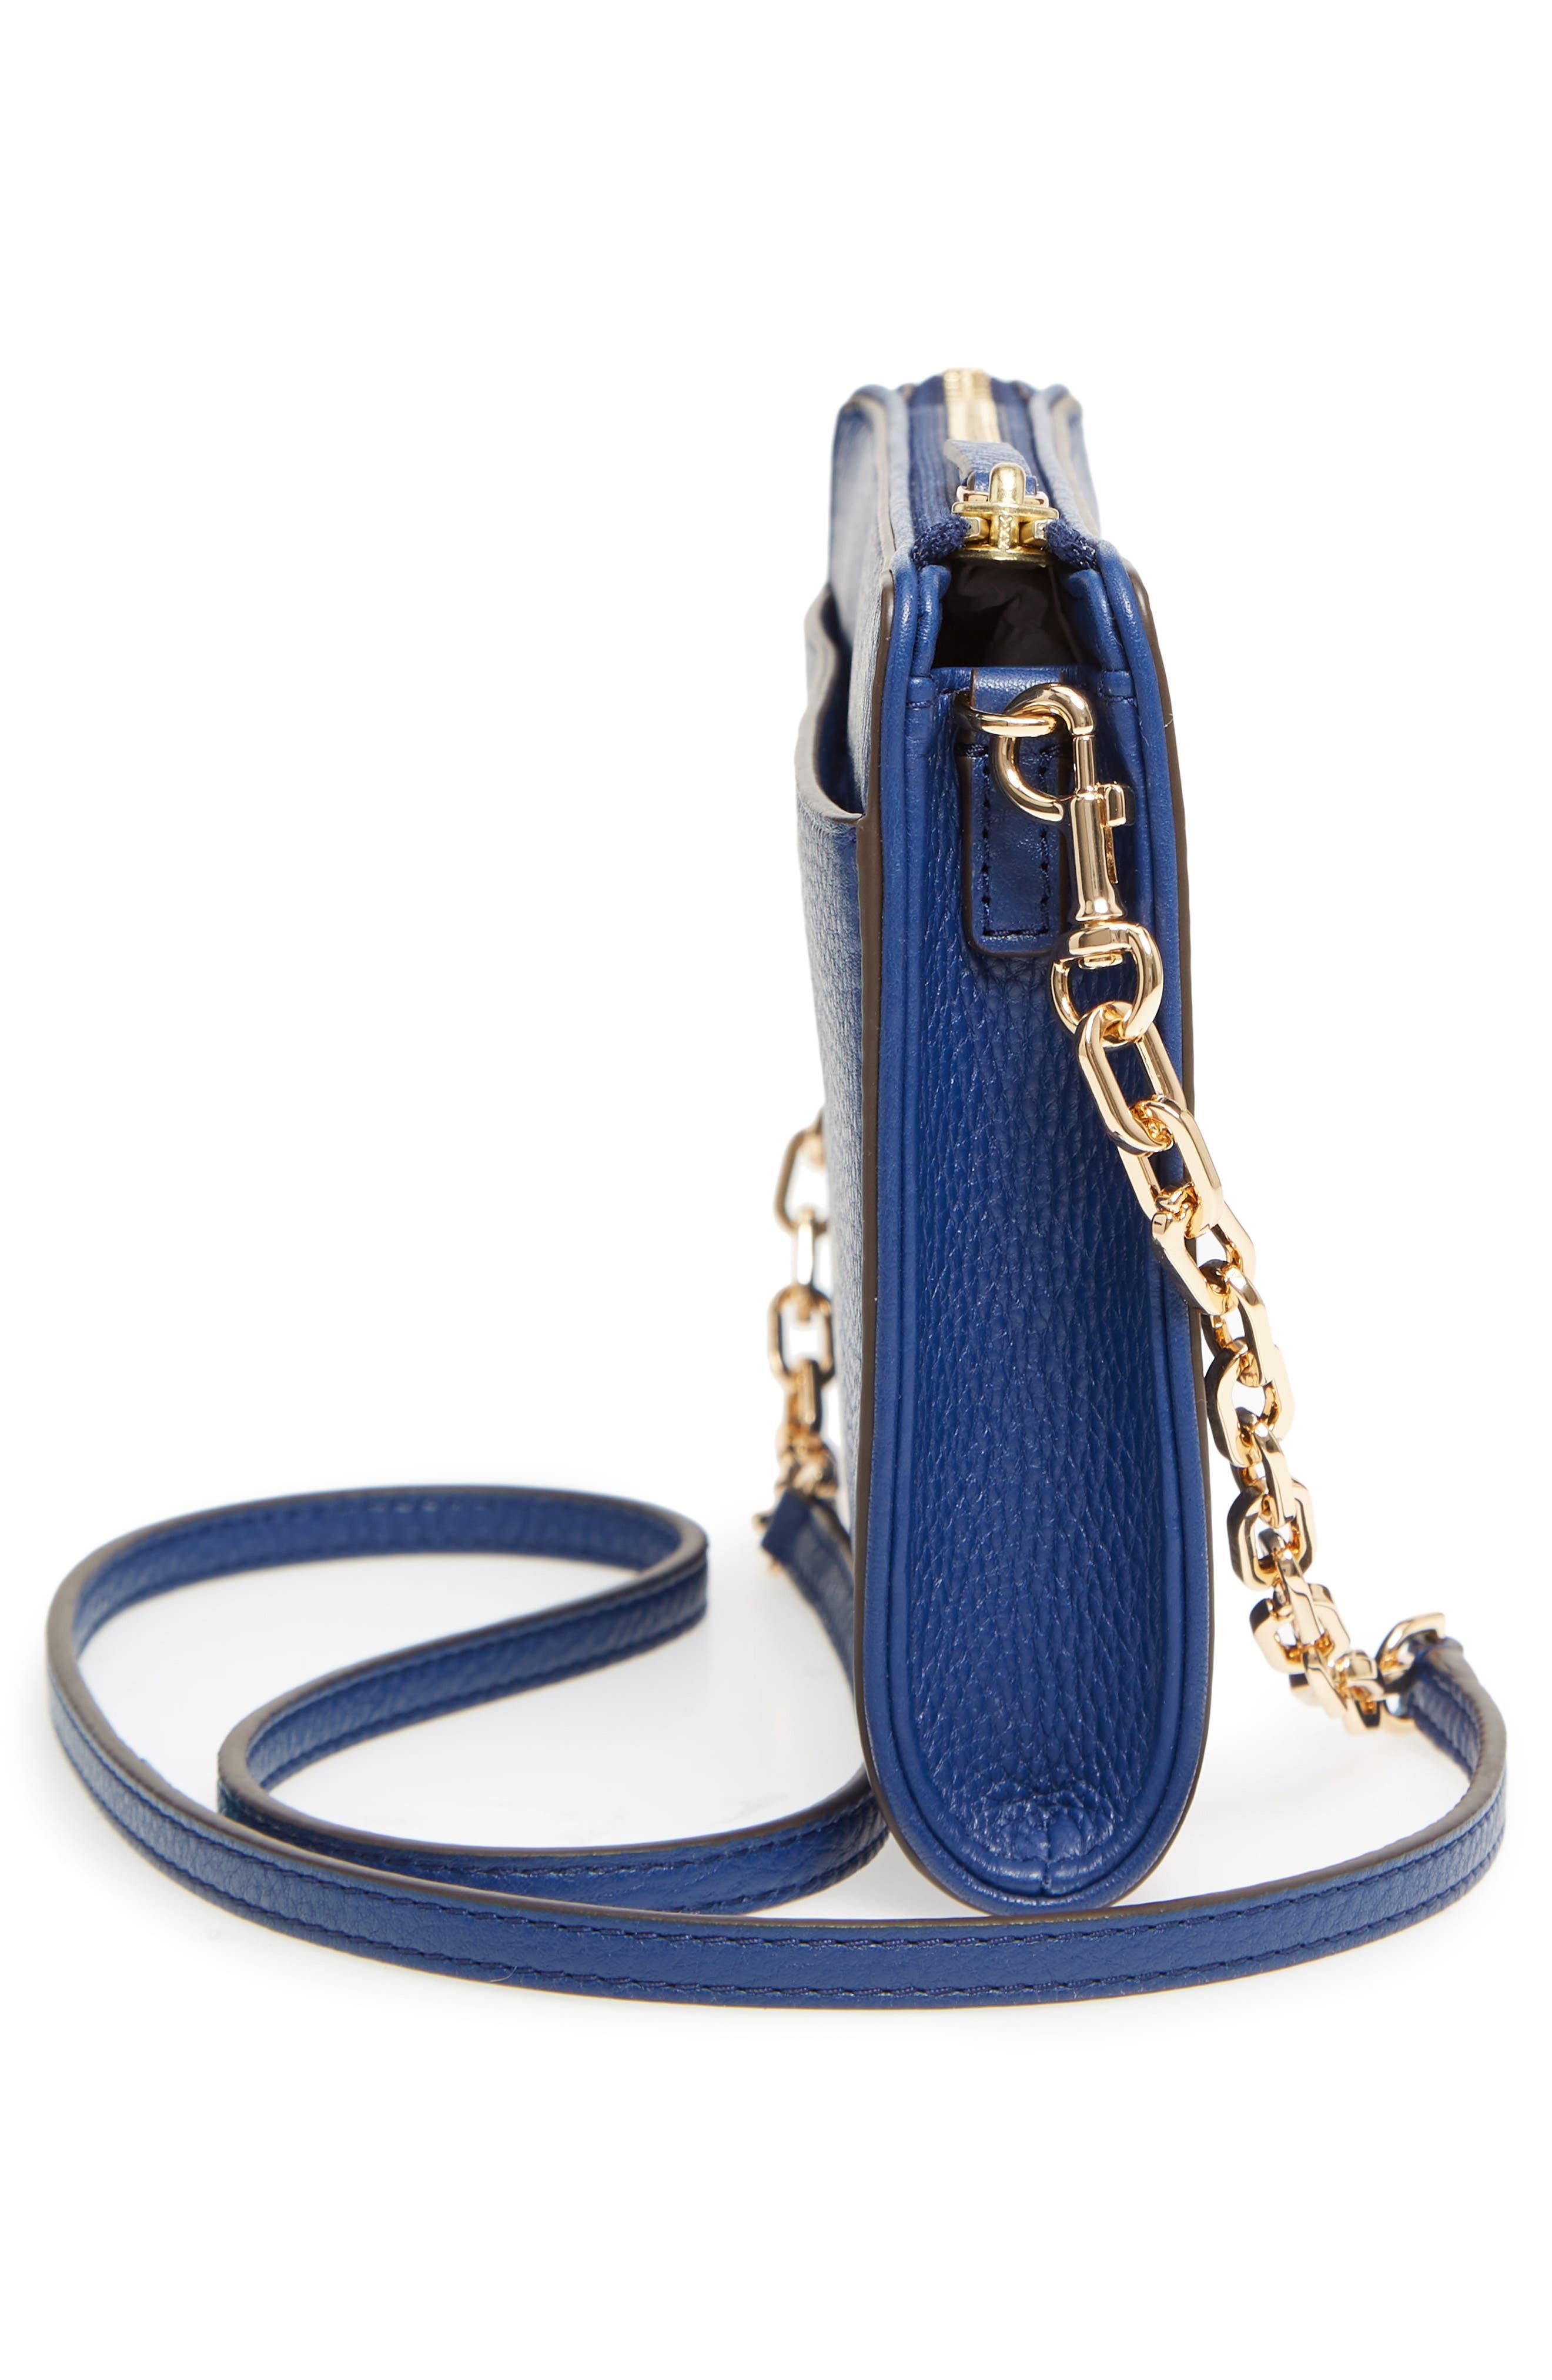 Marsden Leather Wallet Crossbody Bag,                             Alternate thumbnail 5, color,                             FRESH BLUEBERRY